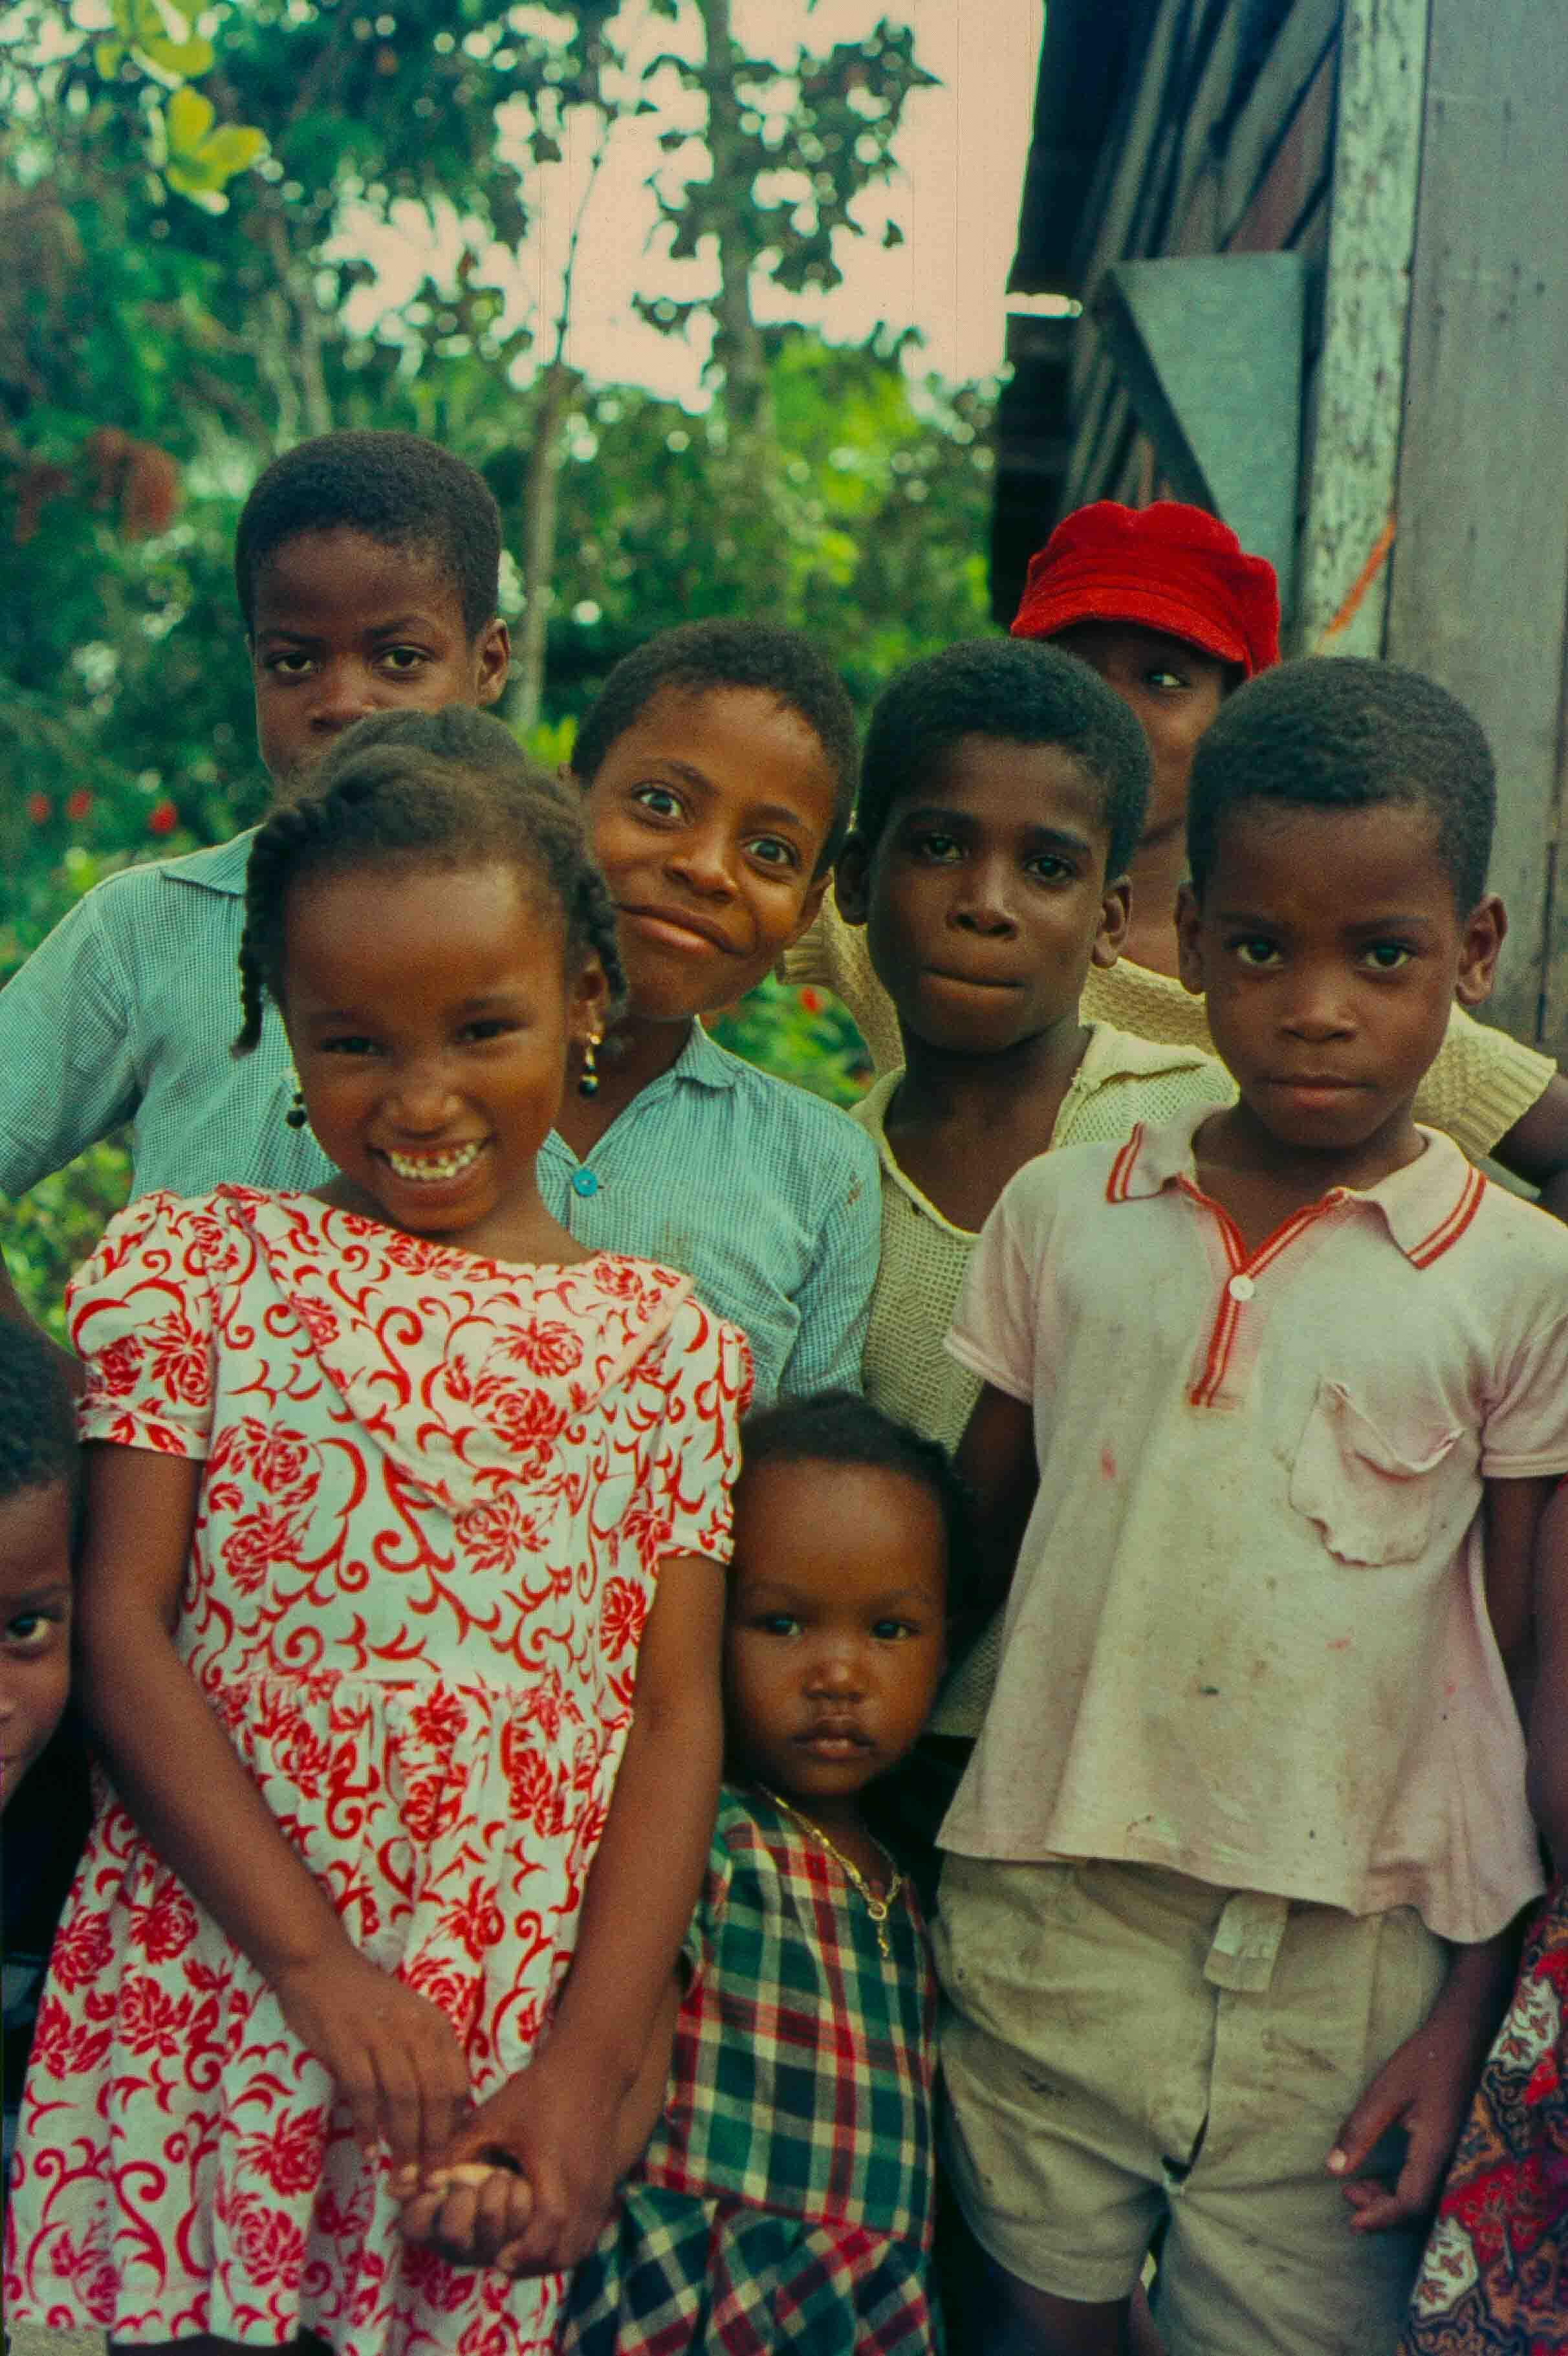 207. Suriname